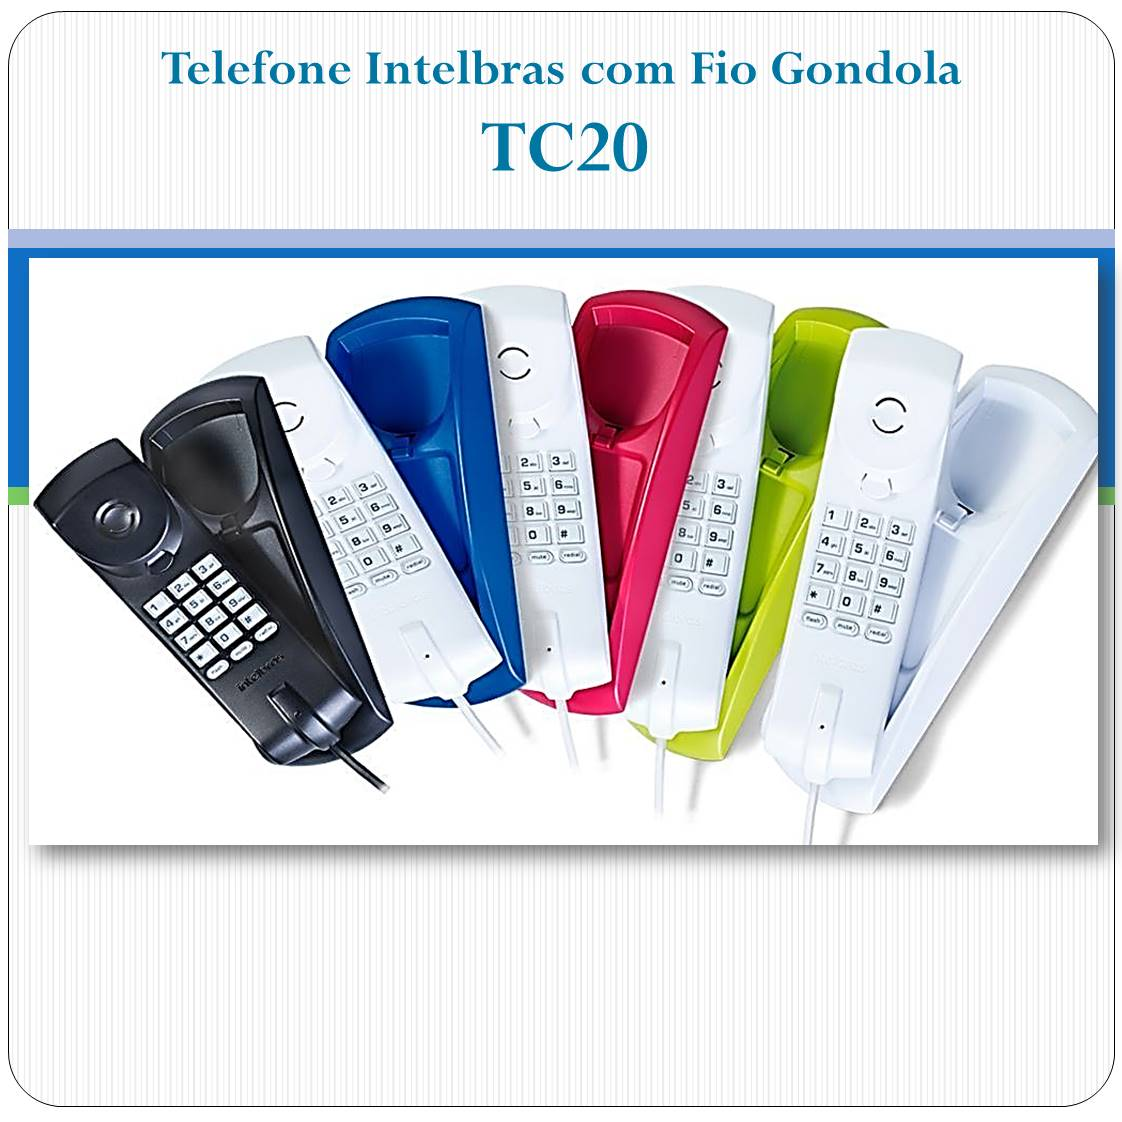 Telefone Intelbras com Fio Gondola TC20